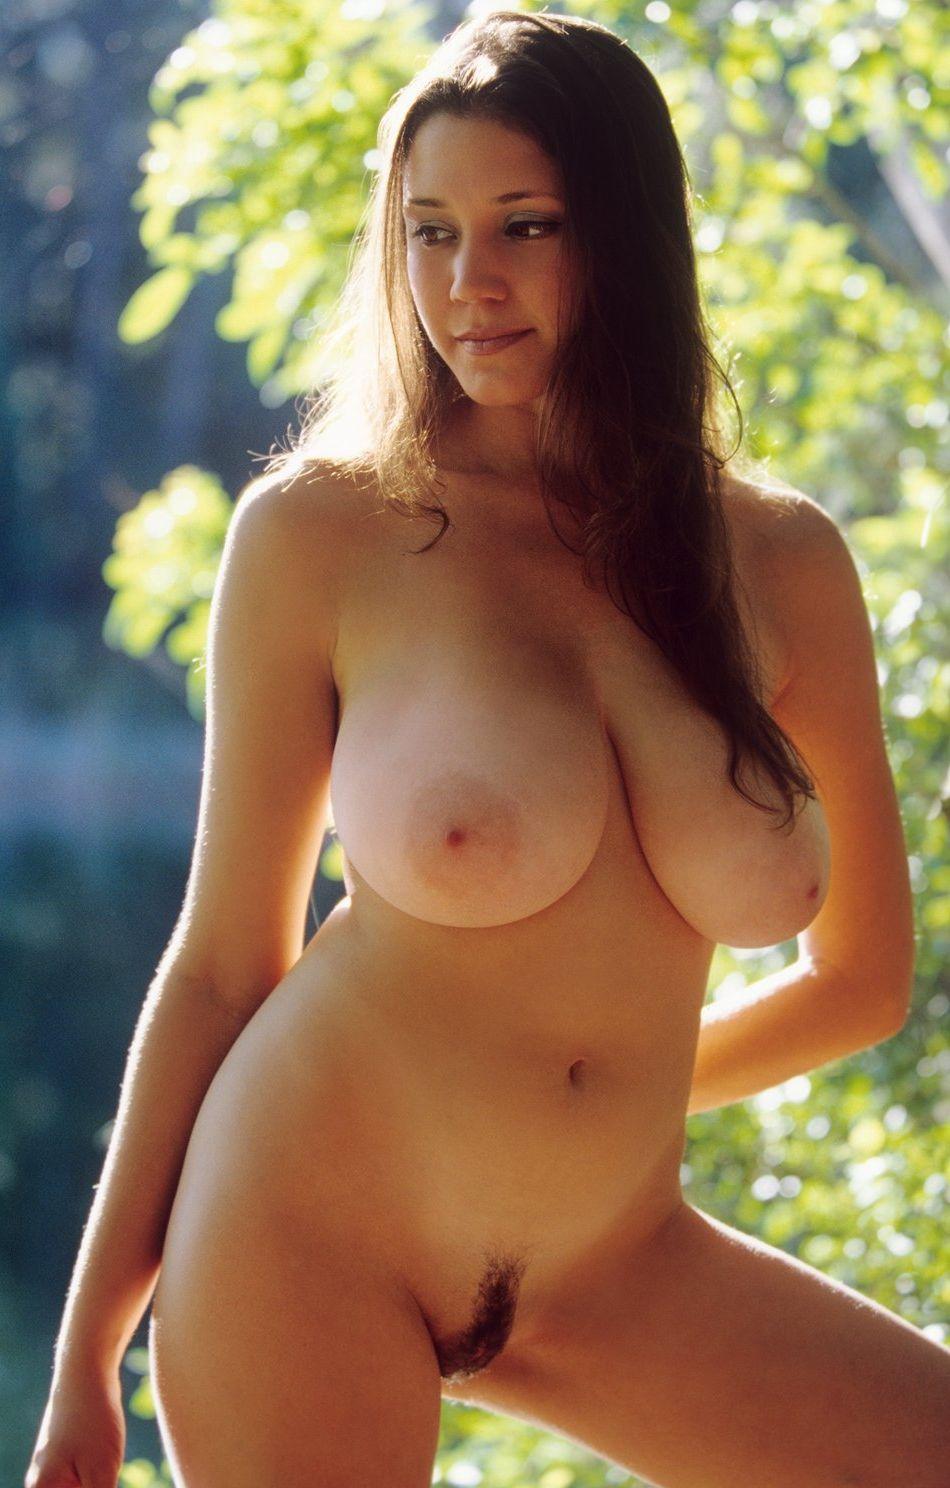 Jenni Rivera Tits Stunning pinc jr. tolentino on hot milf | pinterest | nude, college